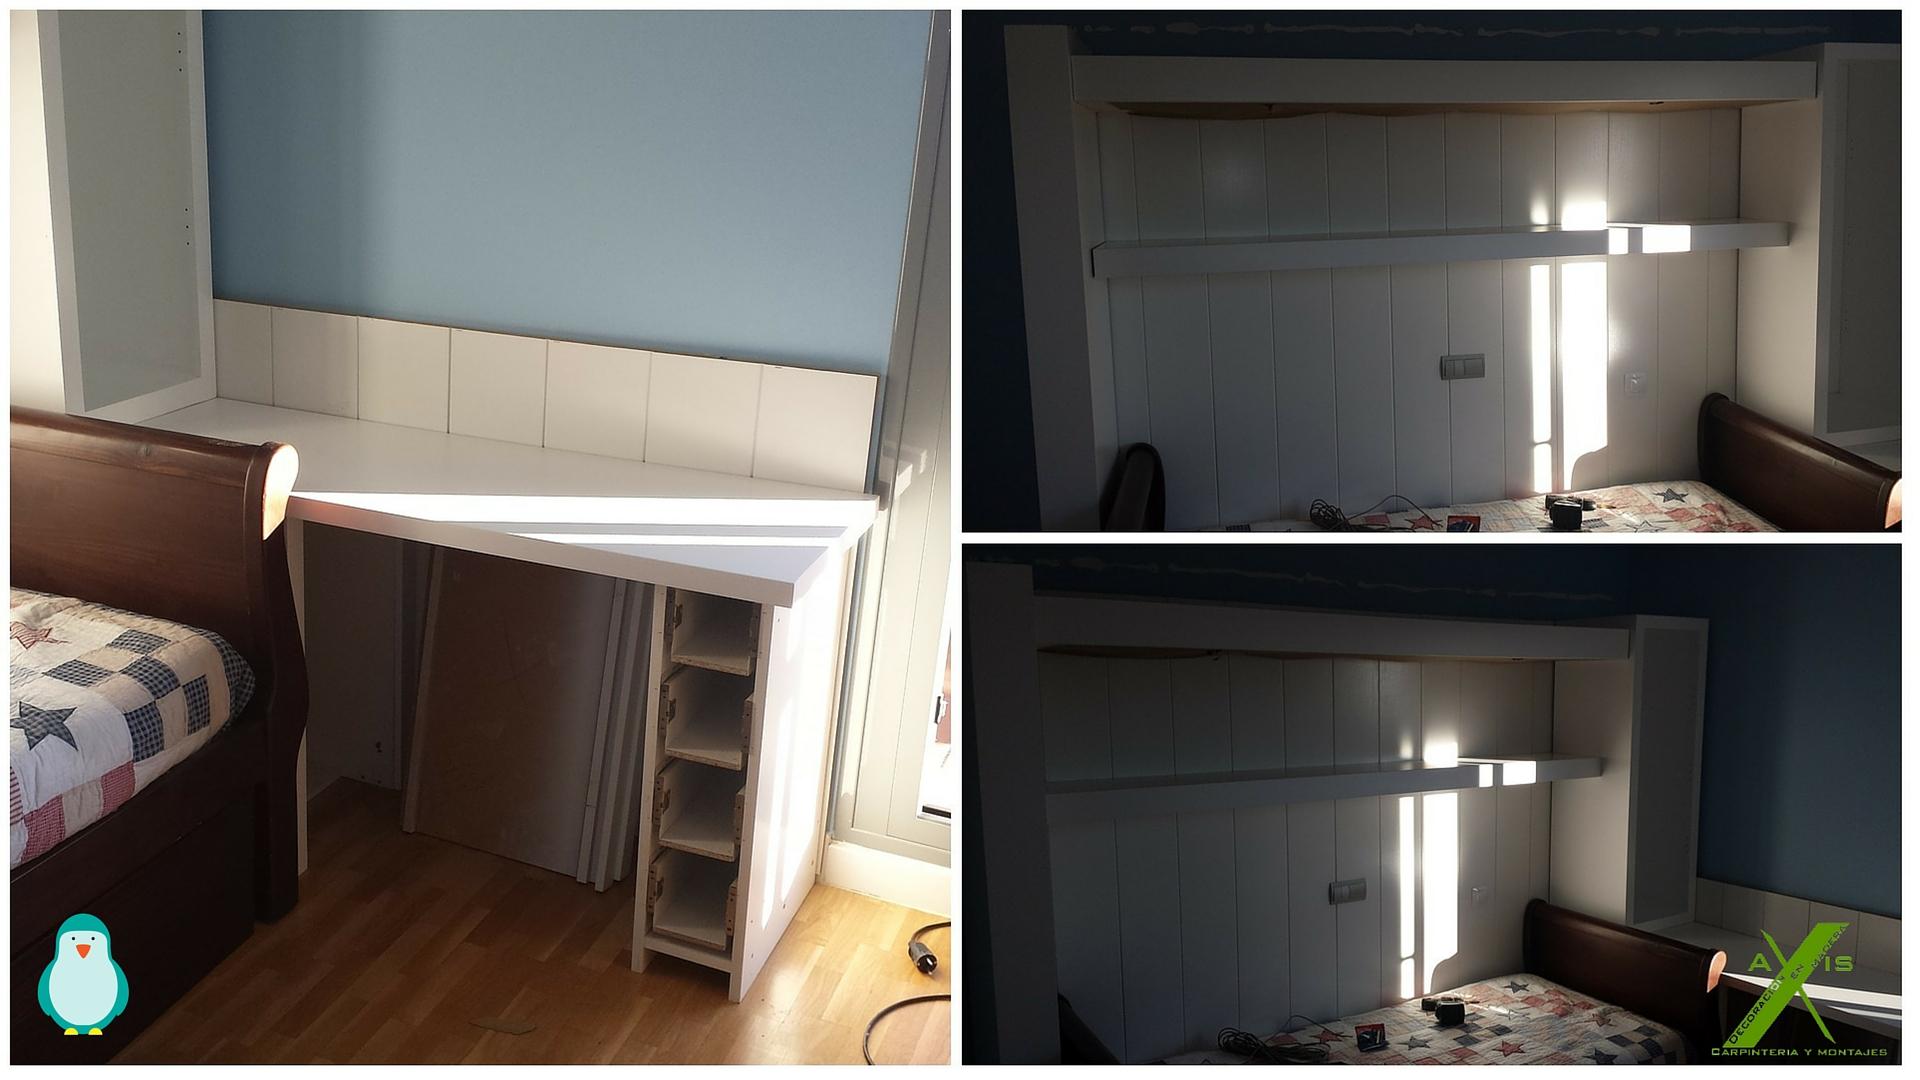 Dormitorio Infantil Axis Carpinter A Y Dise O ~ Dormitorios Infantiles A Medida